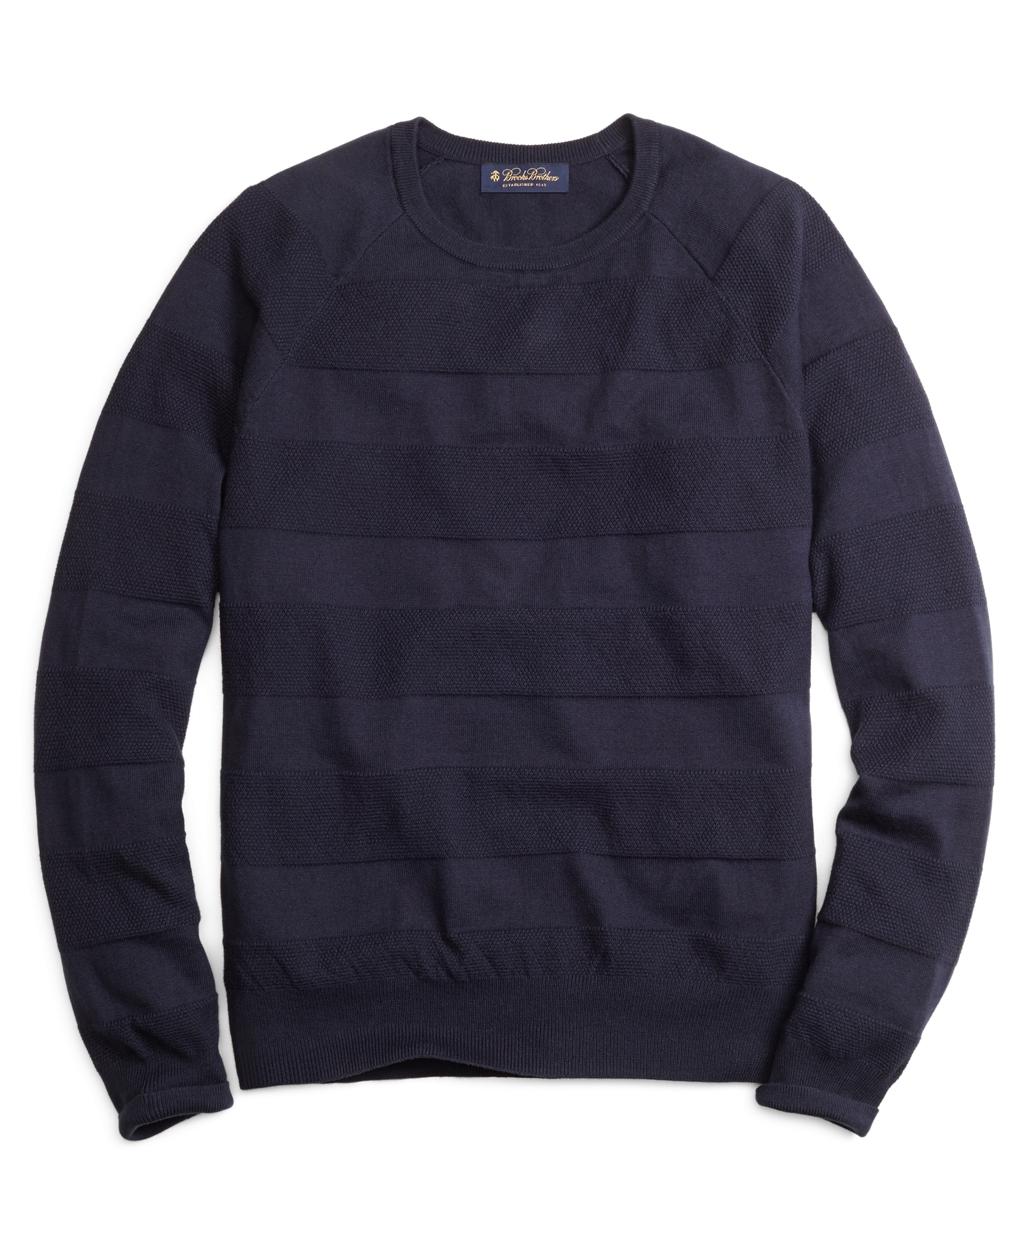 3cf224d8d Lyst - Brooks Brothers Cotton Cashmere Crewneck Tonal Stripe Sweater ...